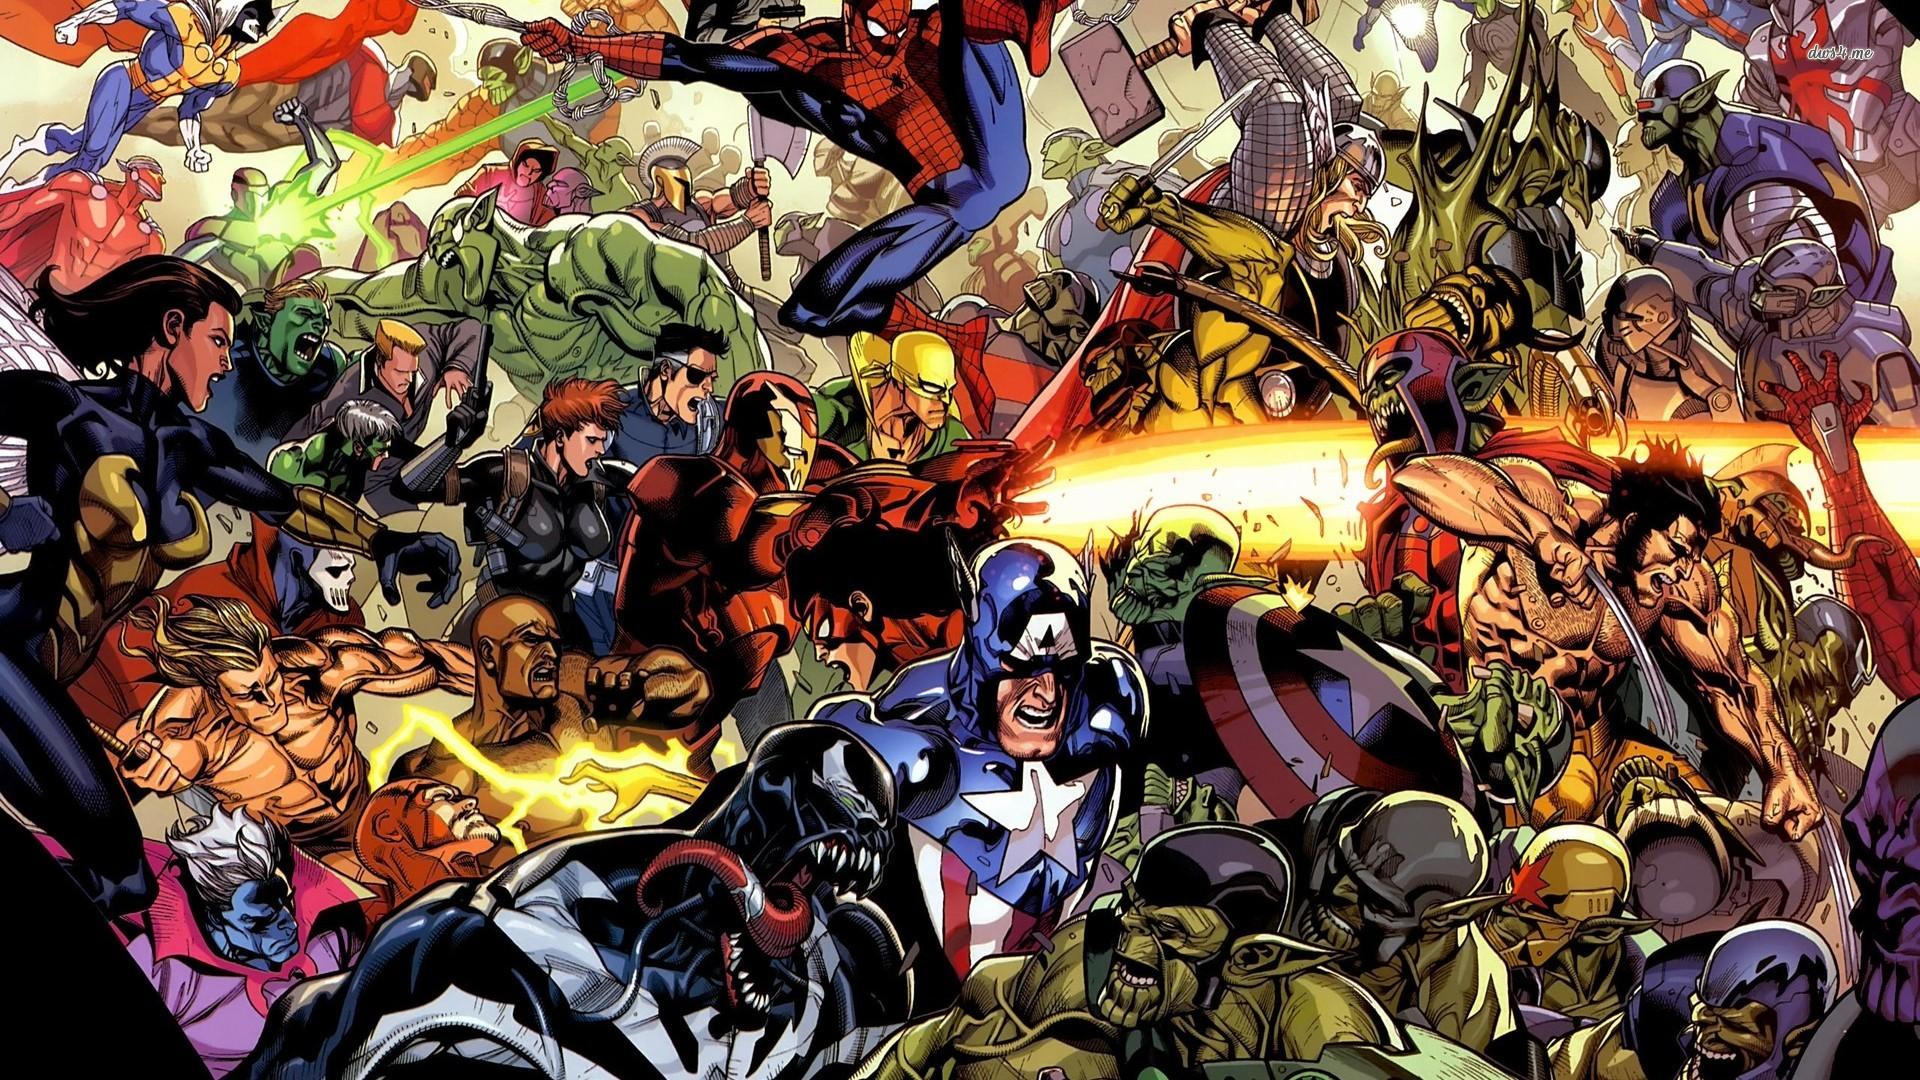 Marvel Superheroes Wallpaper 21944 Wallpaper Wallpaper hd 1920x1080